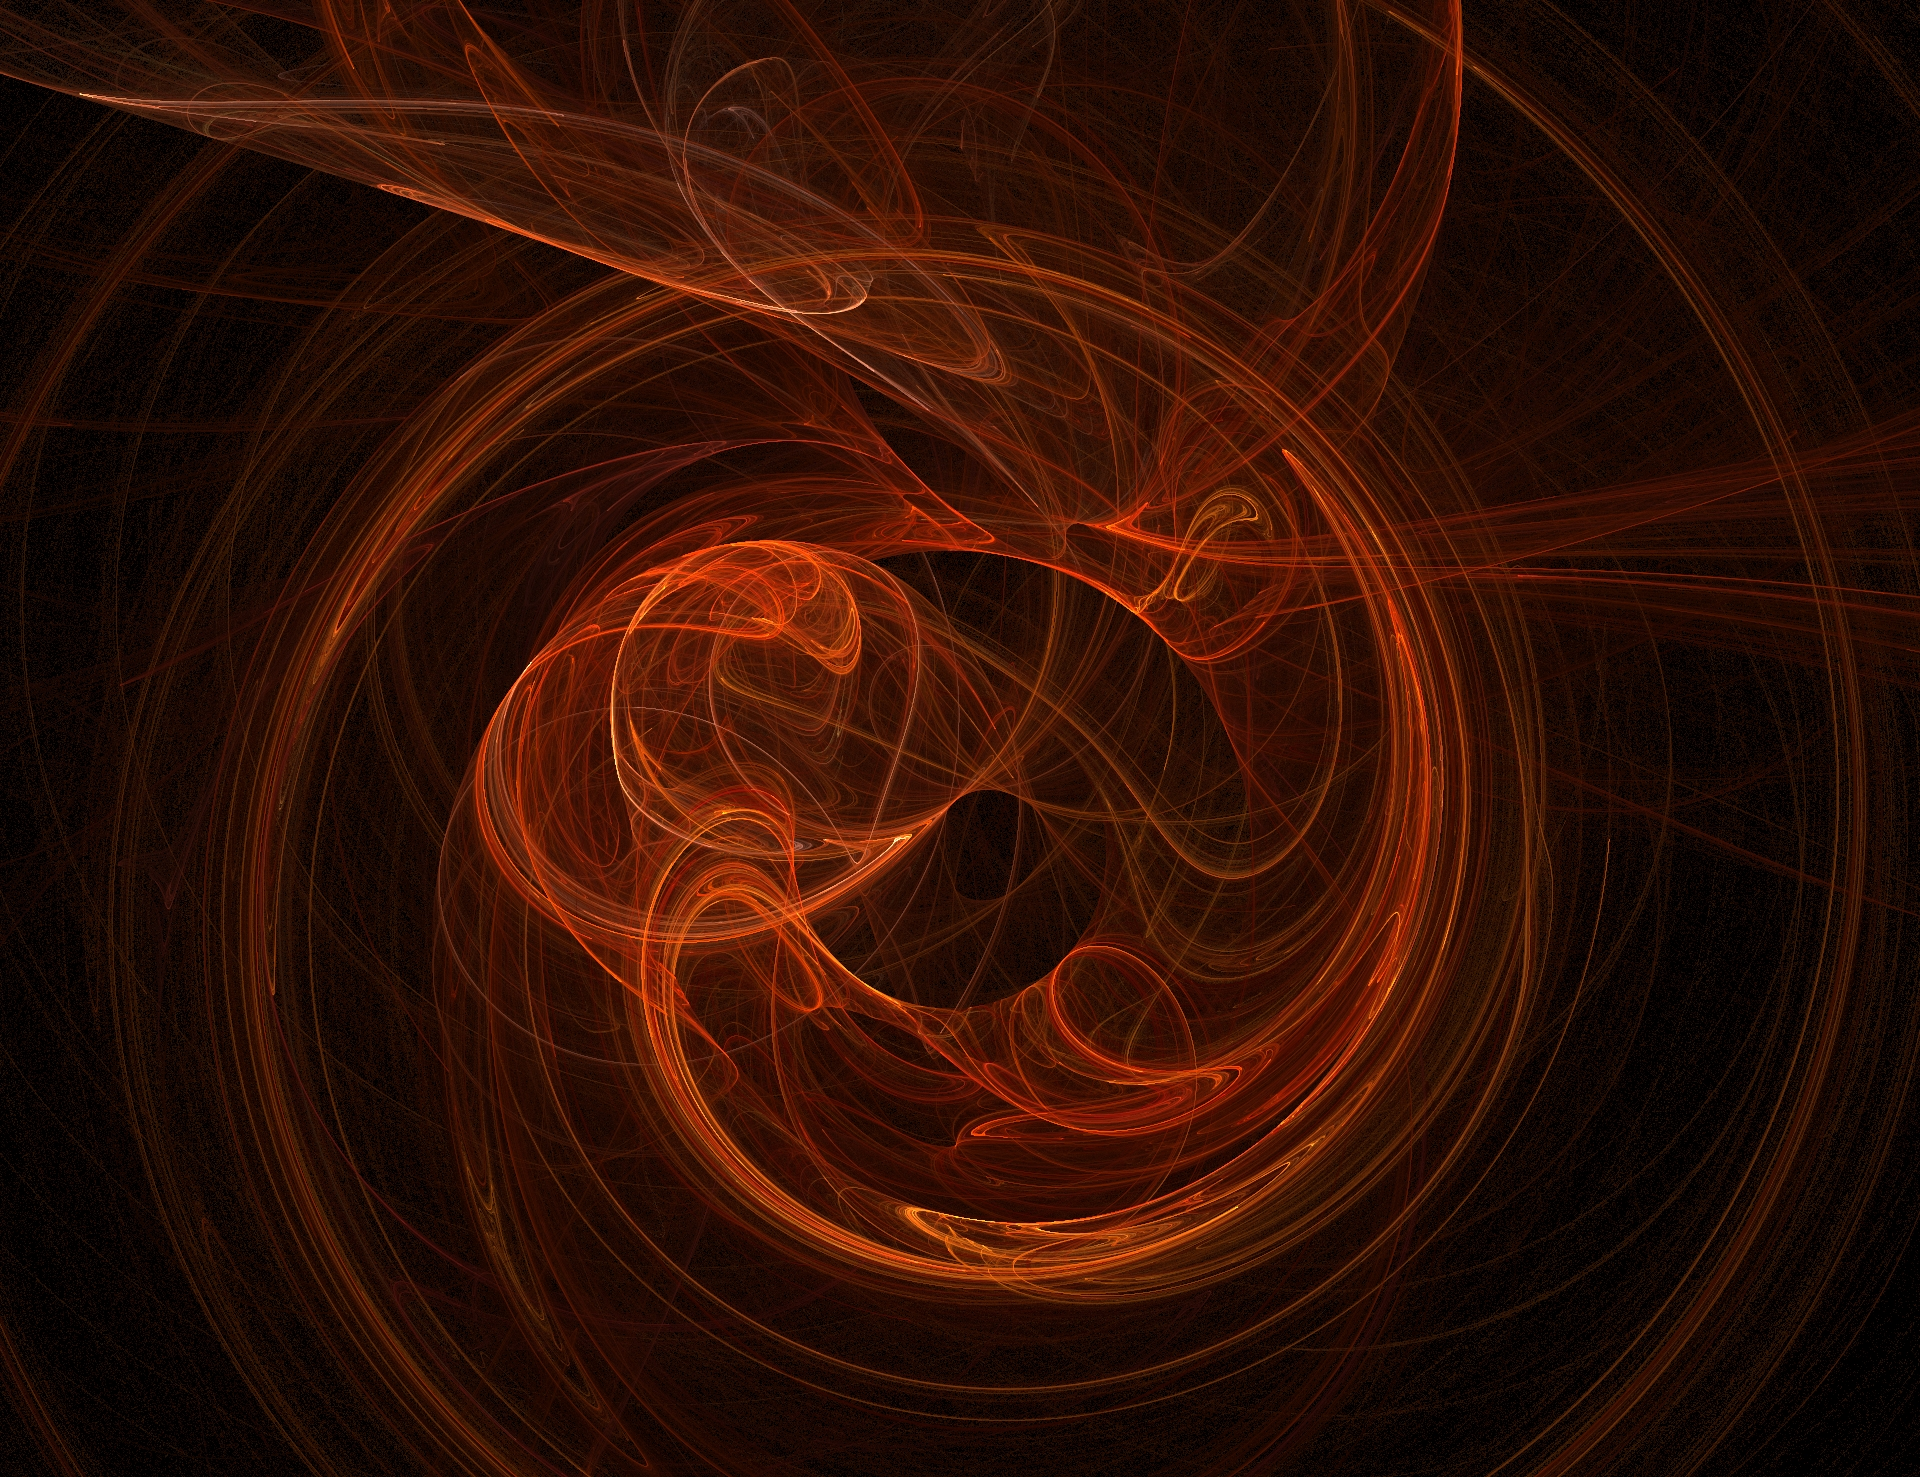 Black Hole Animated Wallpaper Code Challenge Hungry Image Snake Hole 3